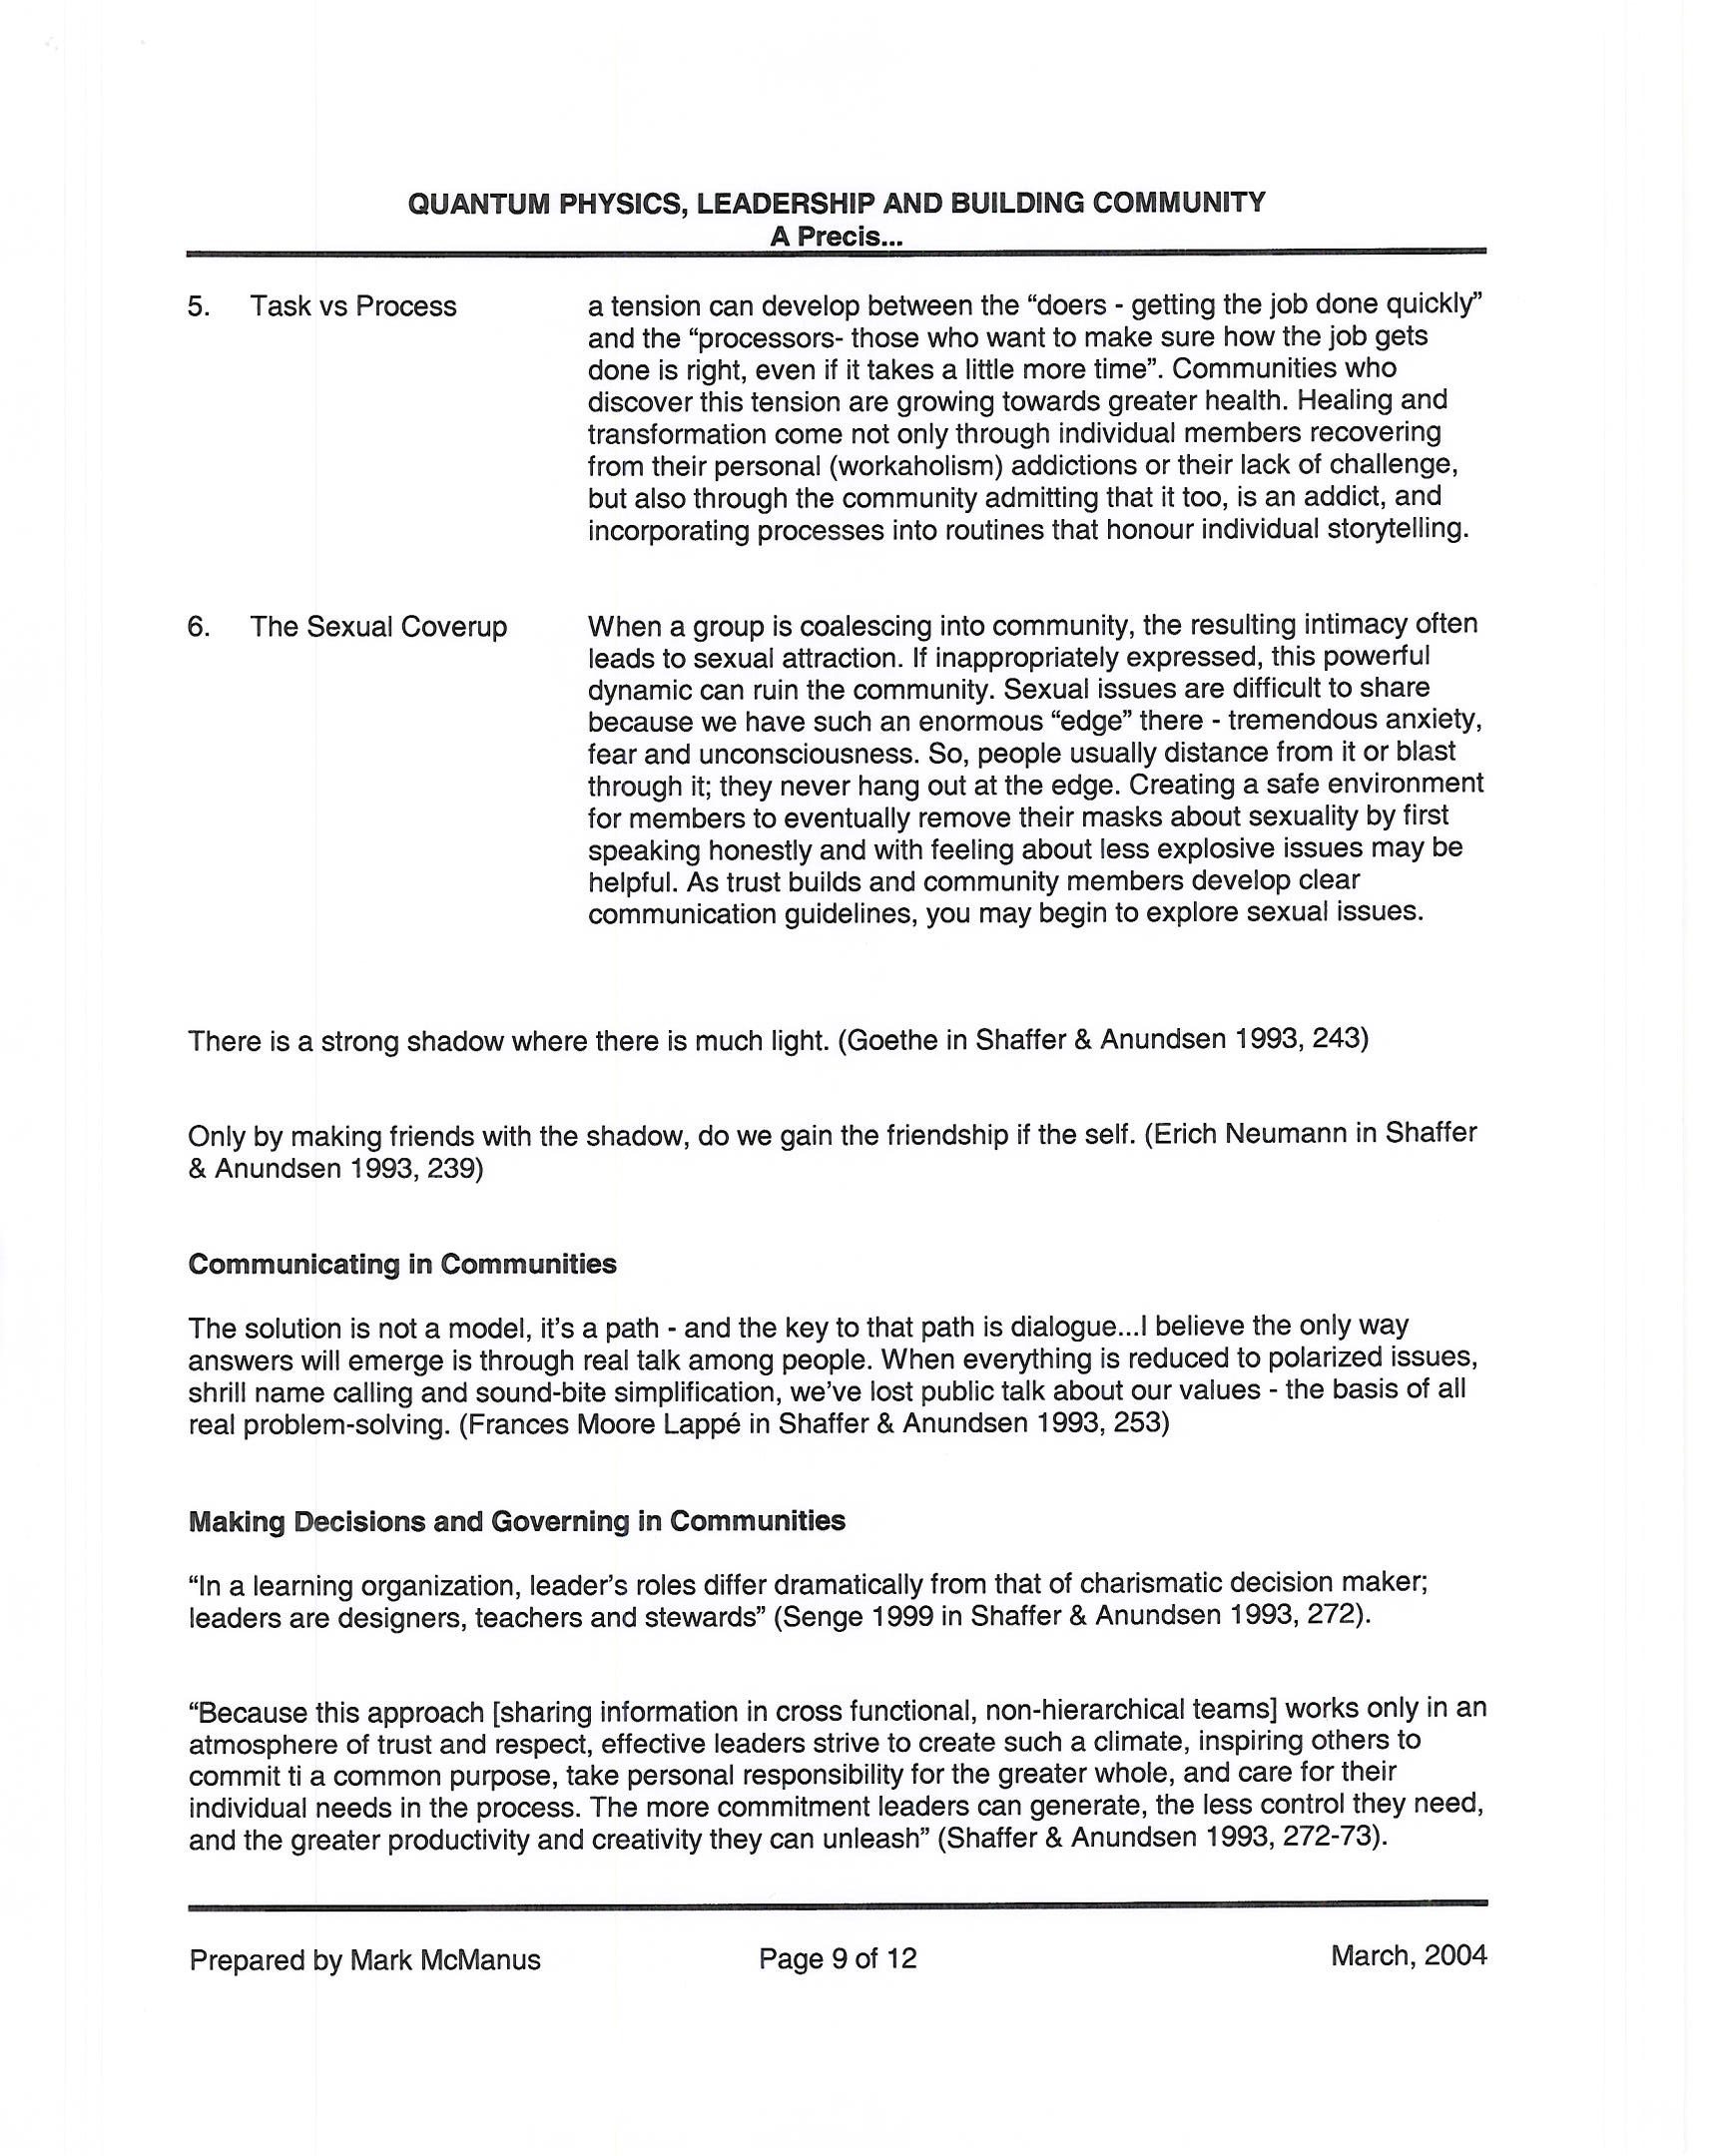 Quantum Physics+Leadership & Community Bldg_Page_09